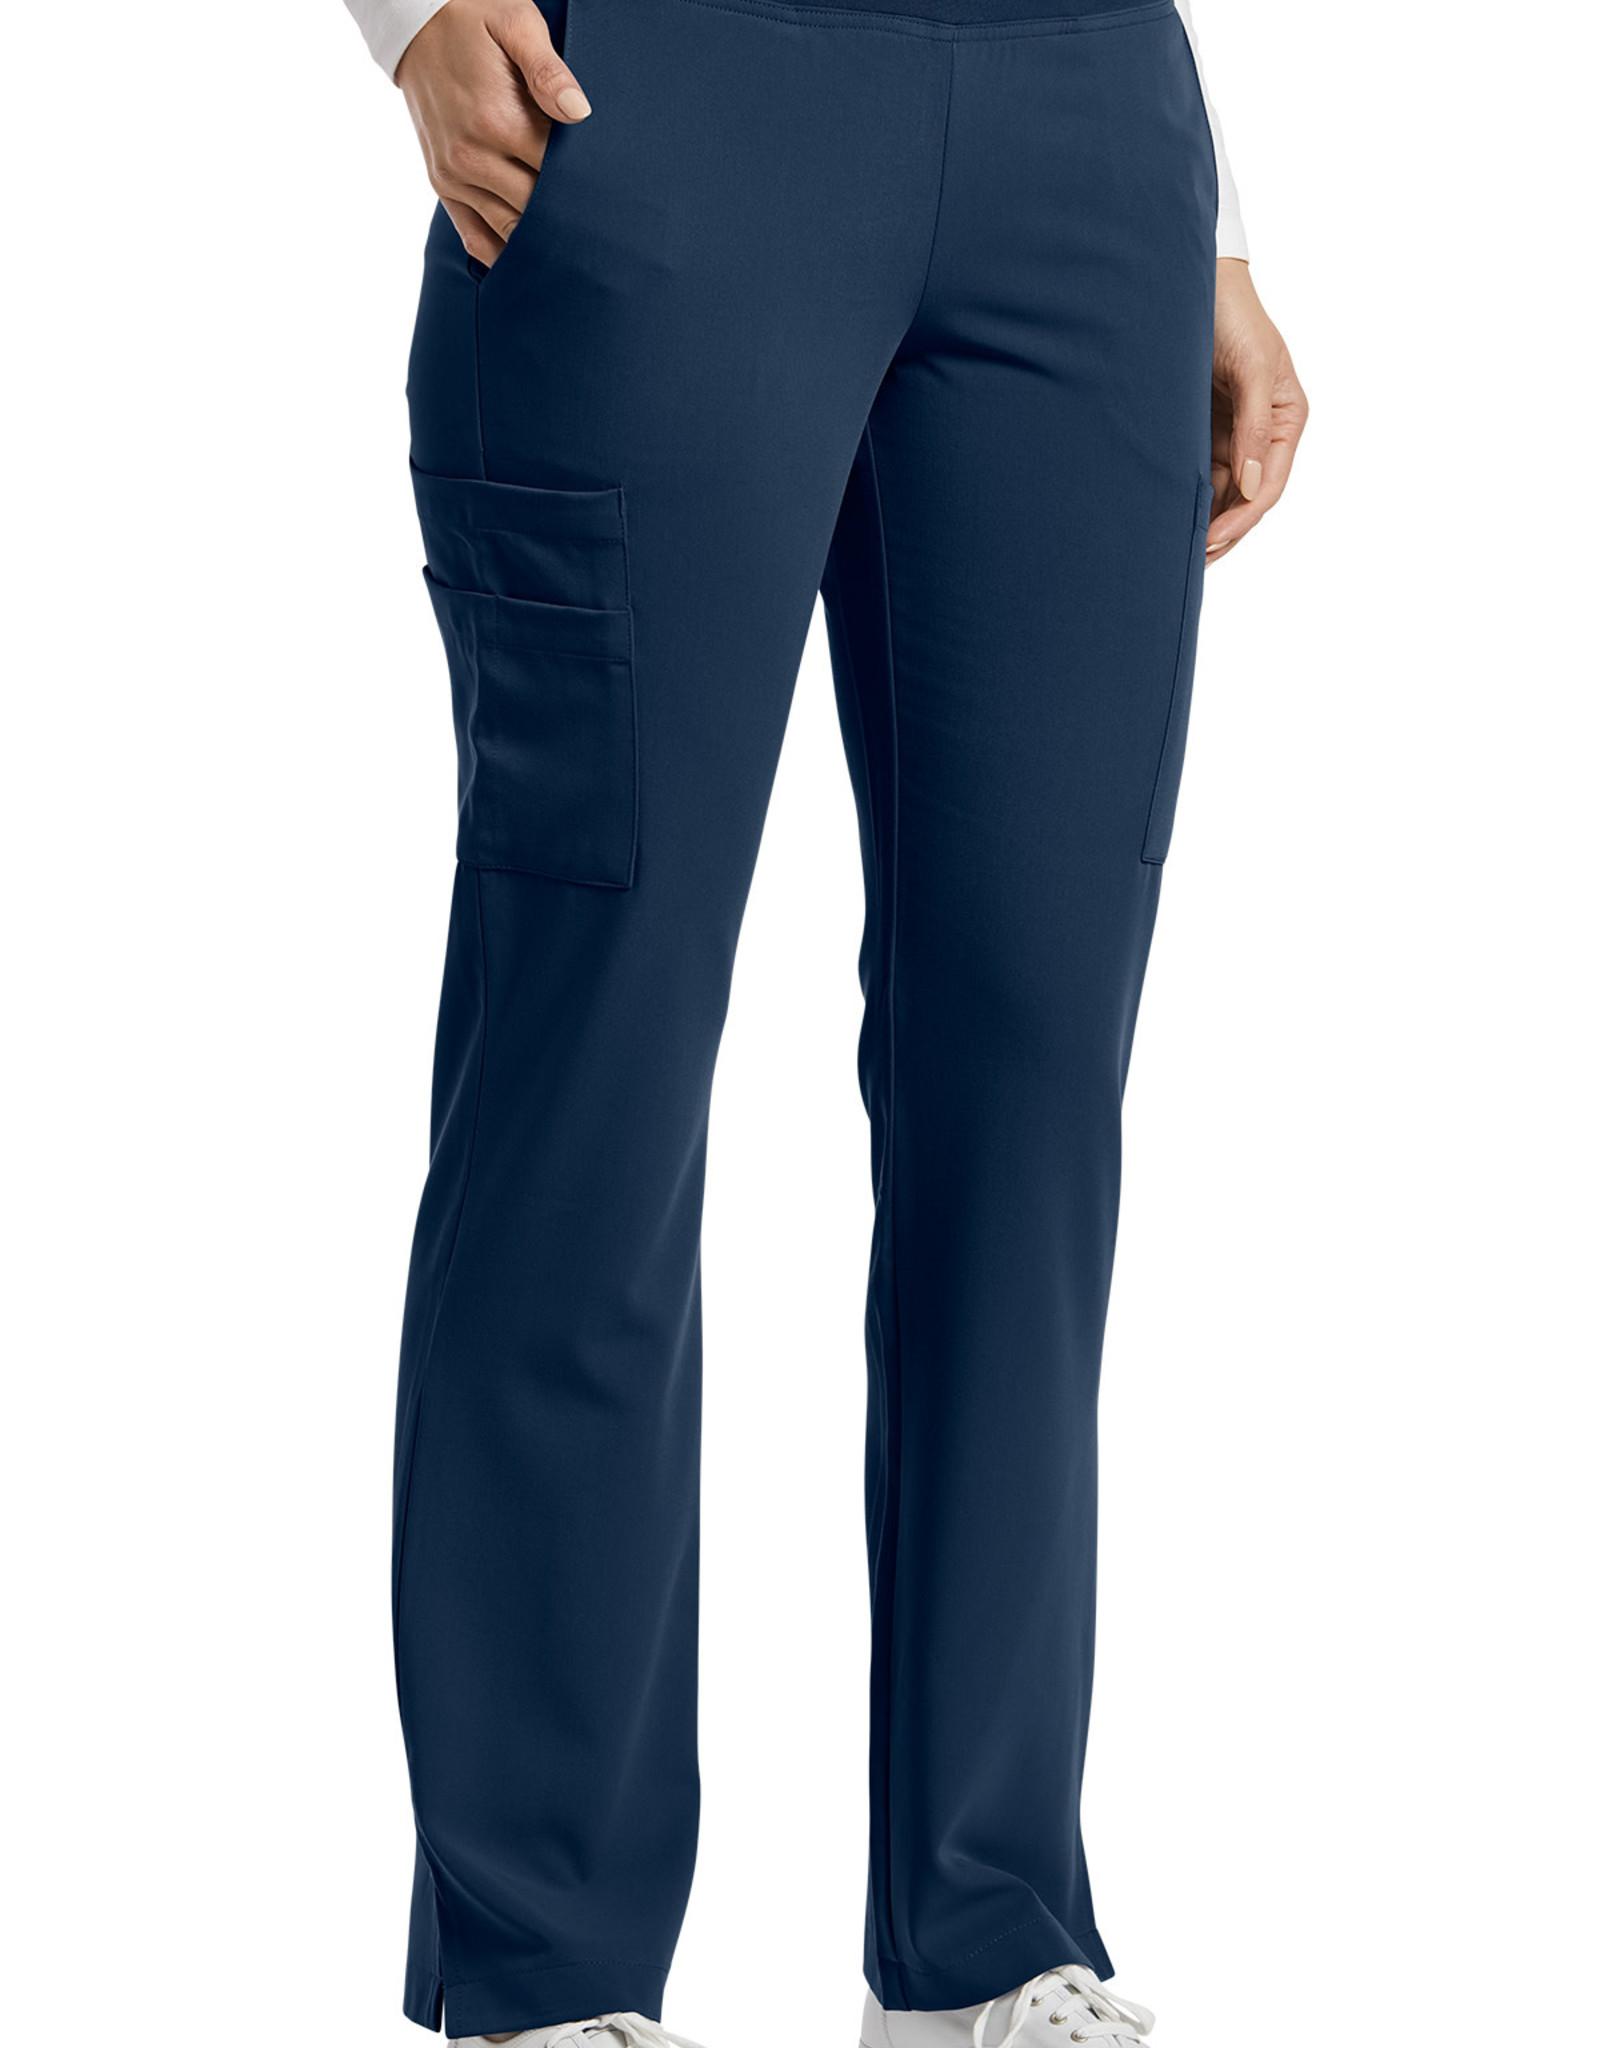 Pantalon Style Yoga Marvella 354